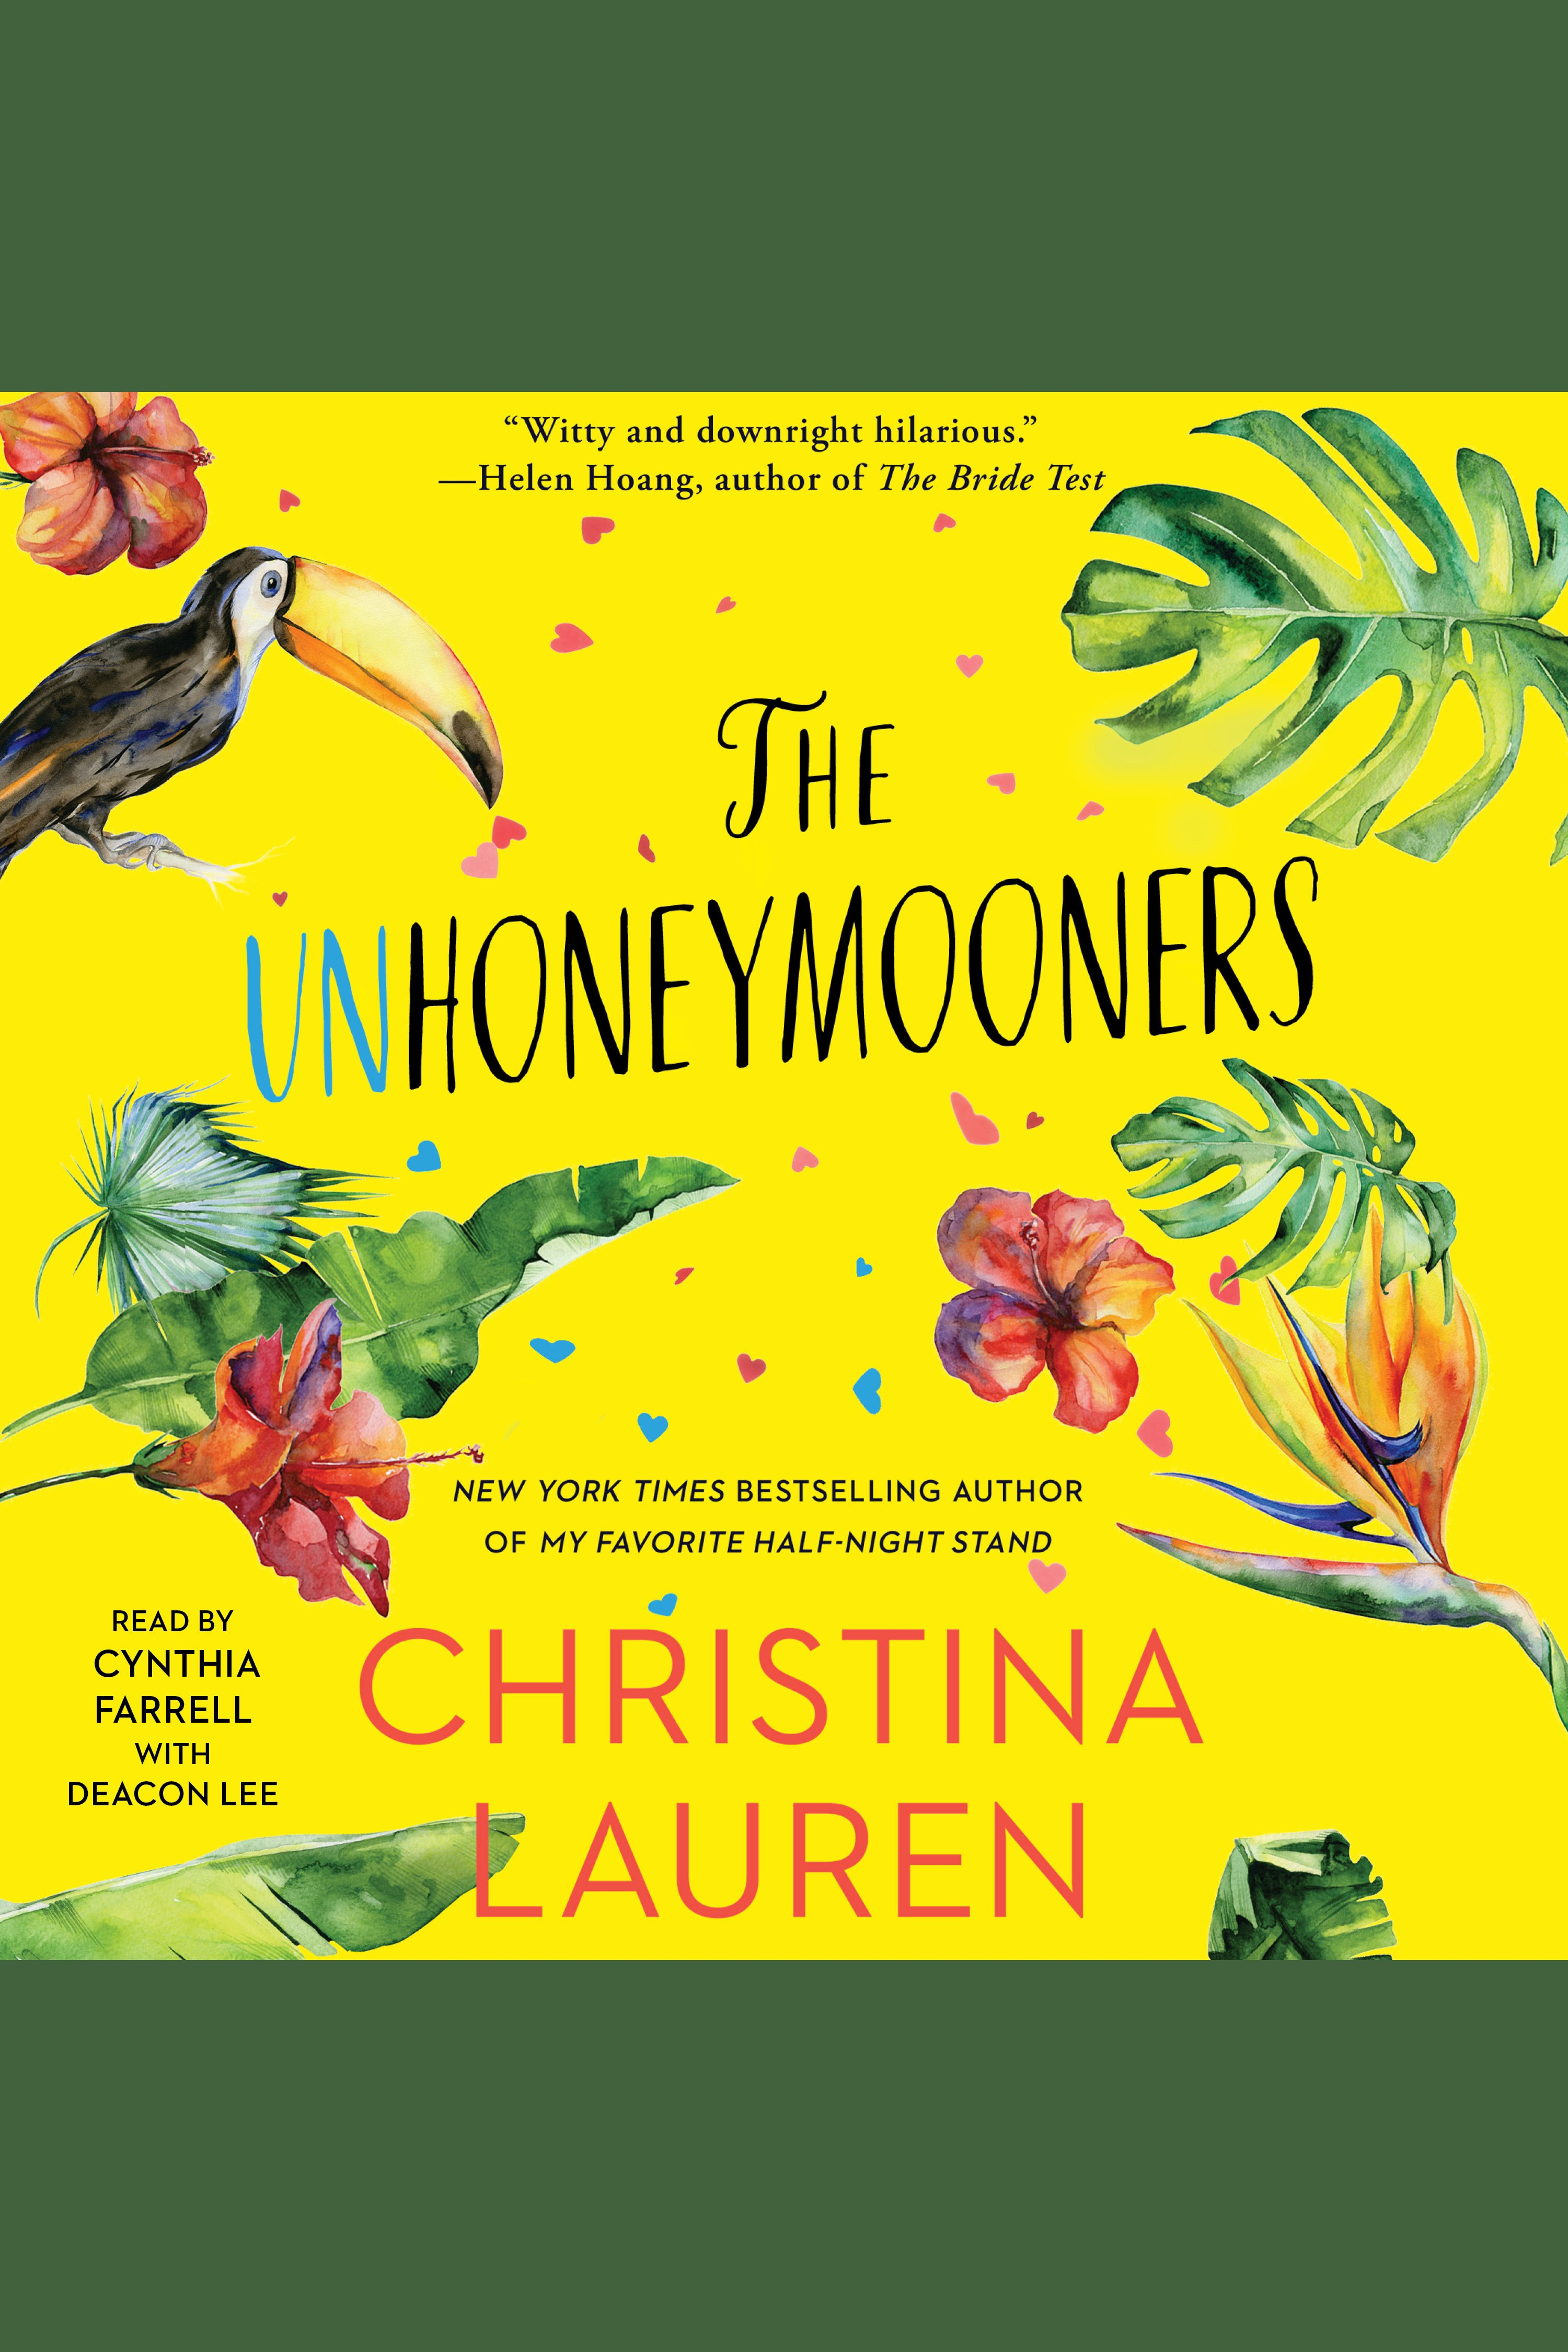 Cover Image of The Unhoneymooners